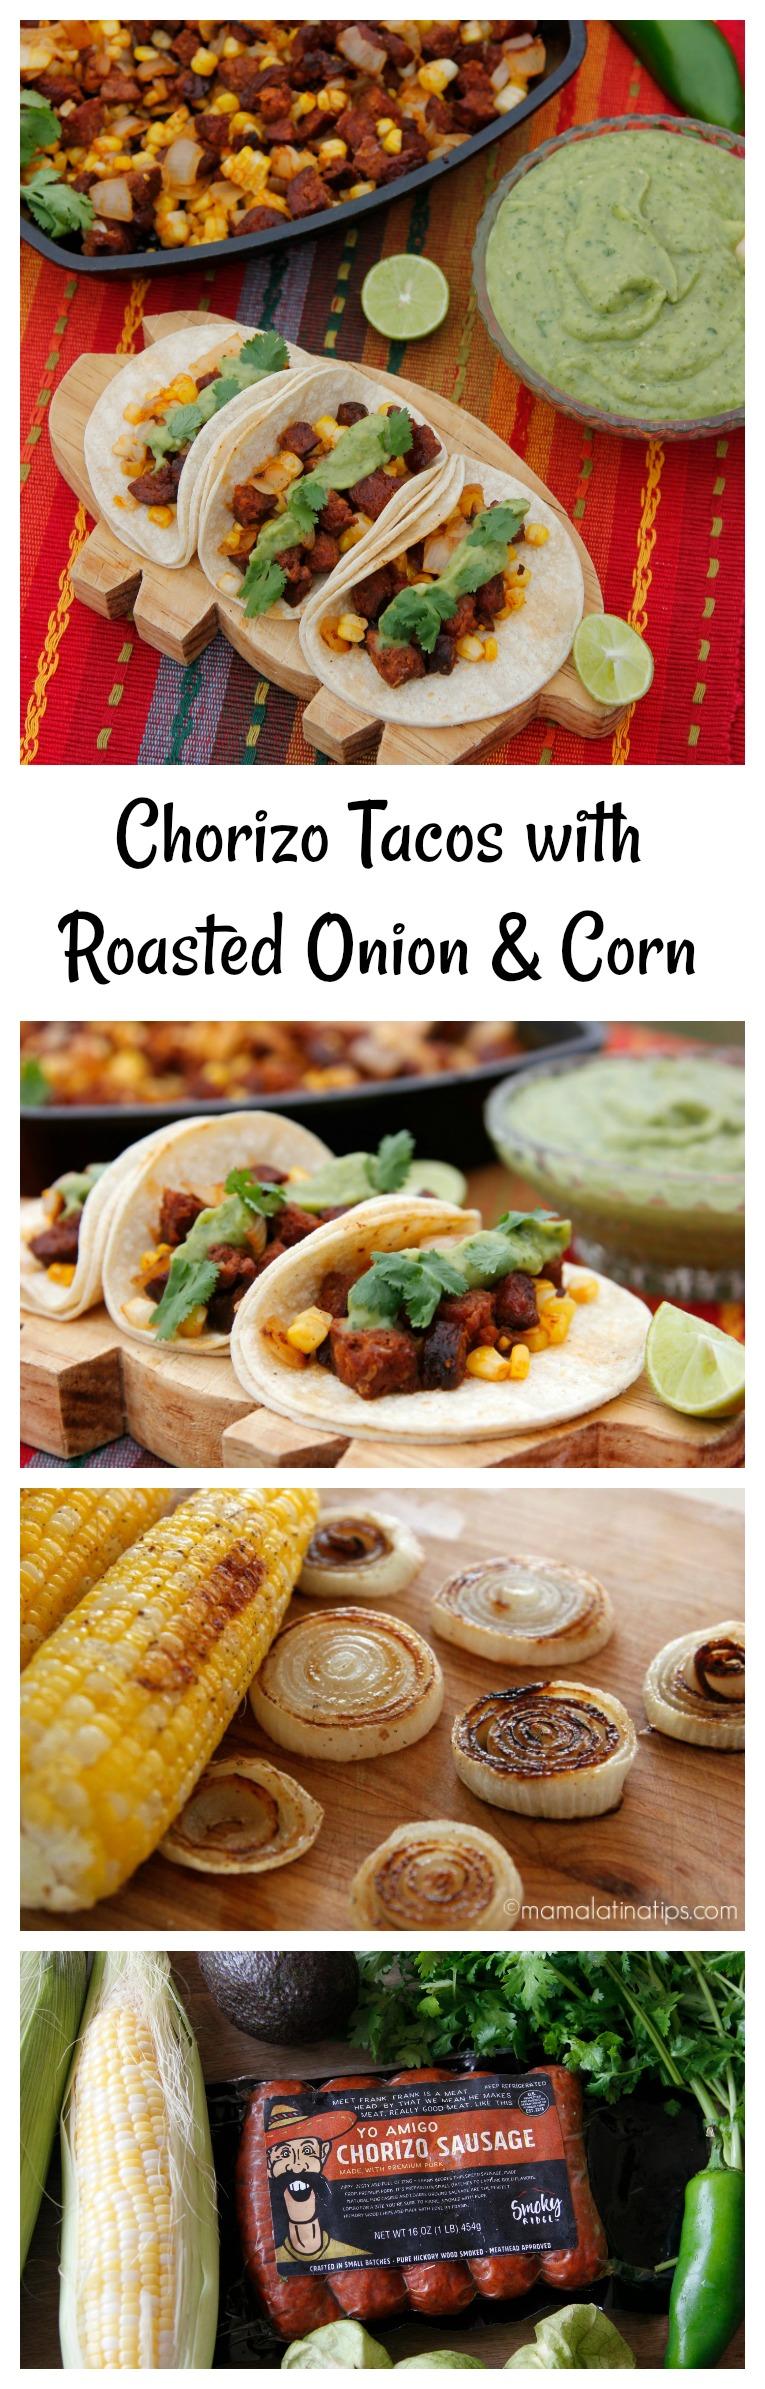 Chorizo tacos with roasted onion, corn and avocado salsa